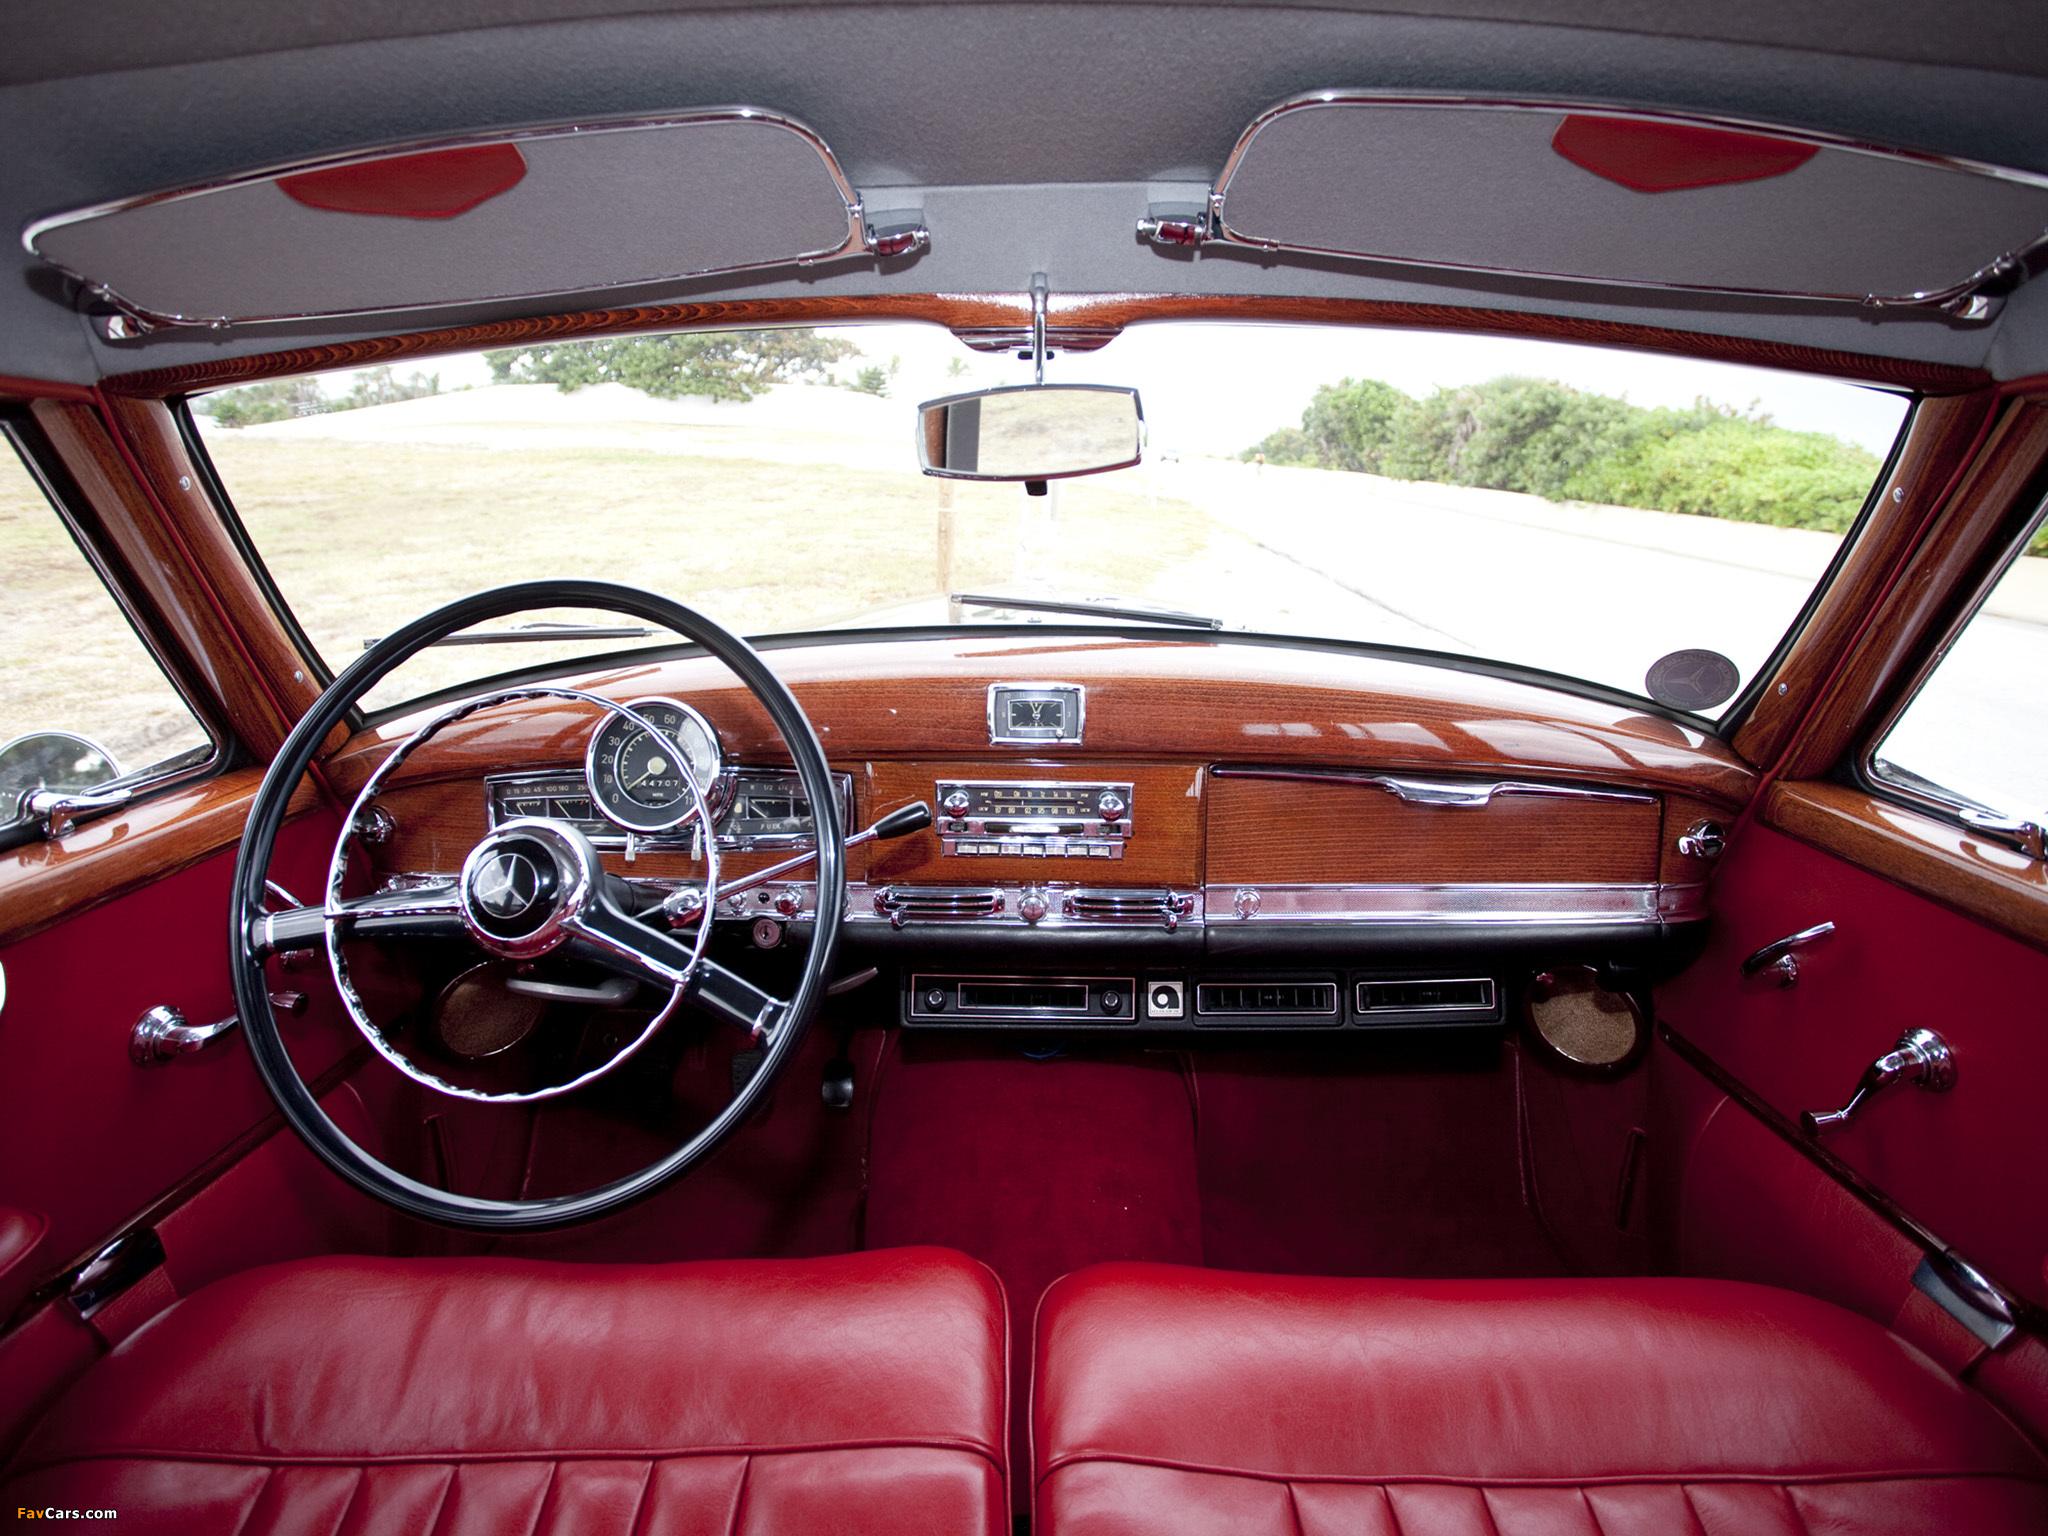 Mercedes Benz Car >> Mercedes-Benz 300c Station Wagon by Binz 1956 photos (2048x1536)